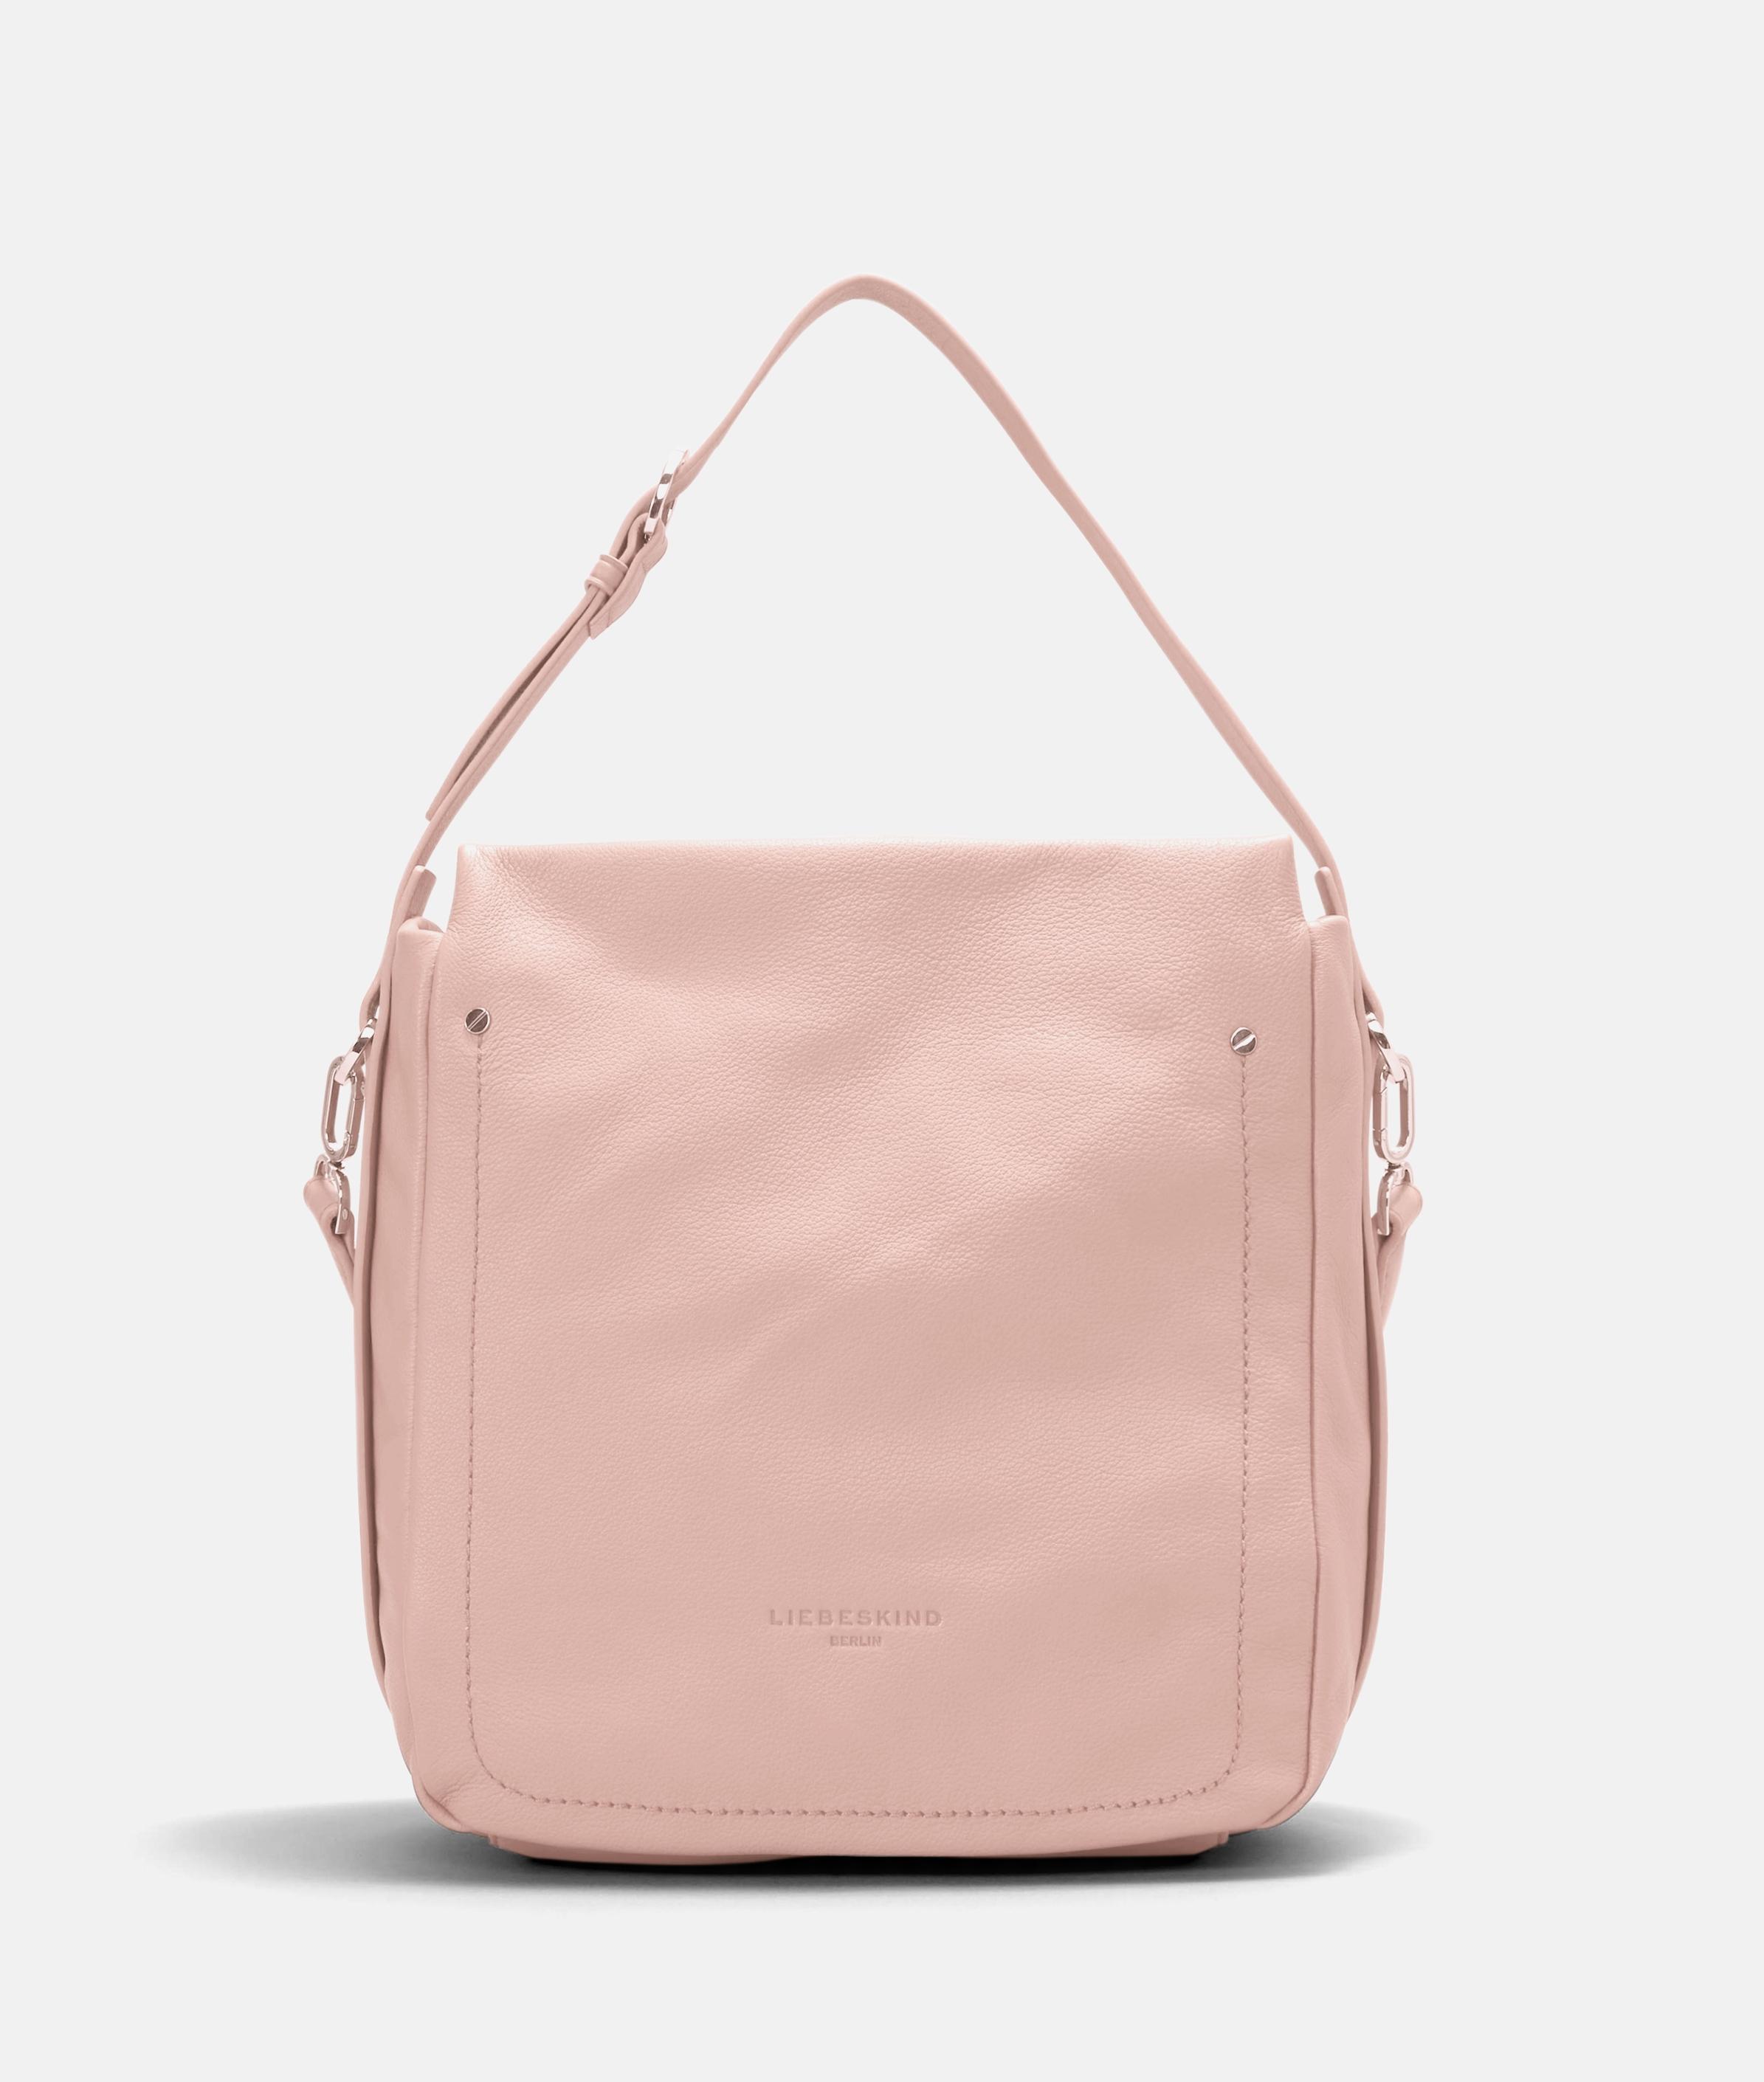 Berlin Tasche Stud Strap Hobo M, Pink